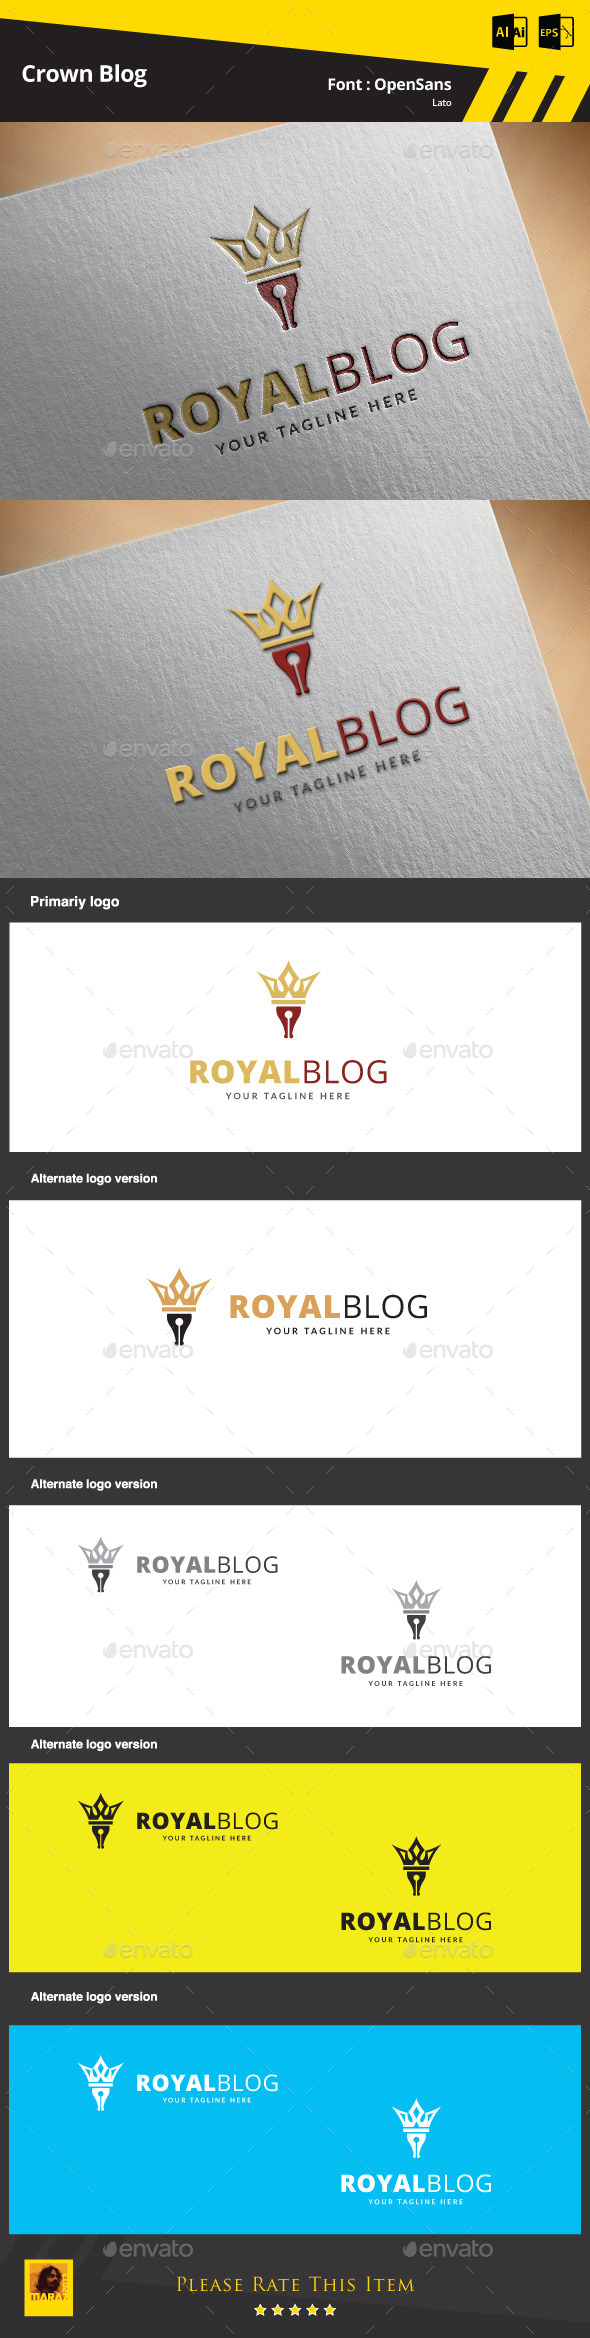 GraphicRiver Crown Blog Logo Template 9467669